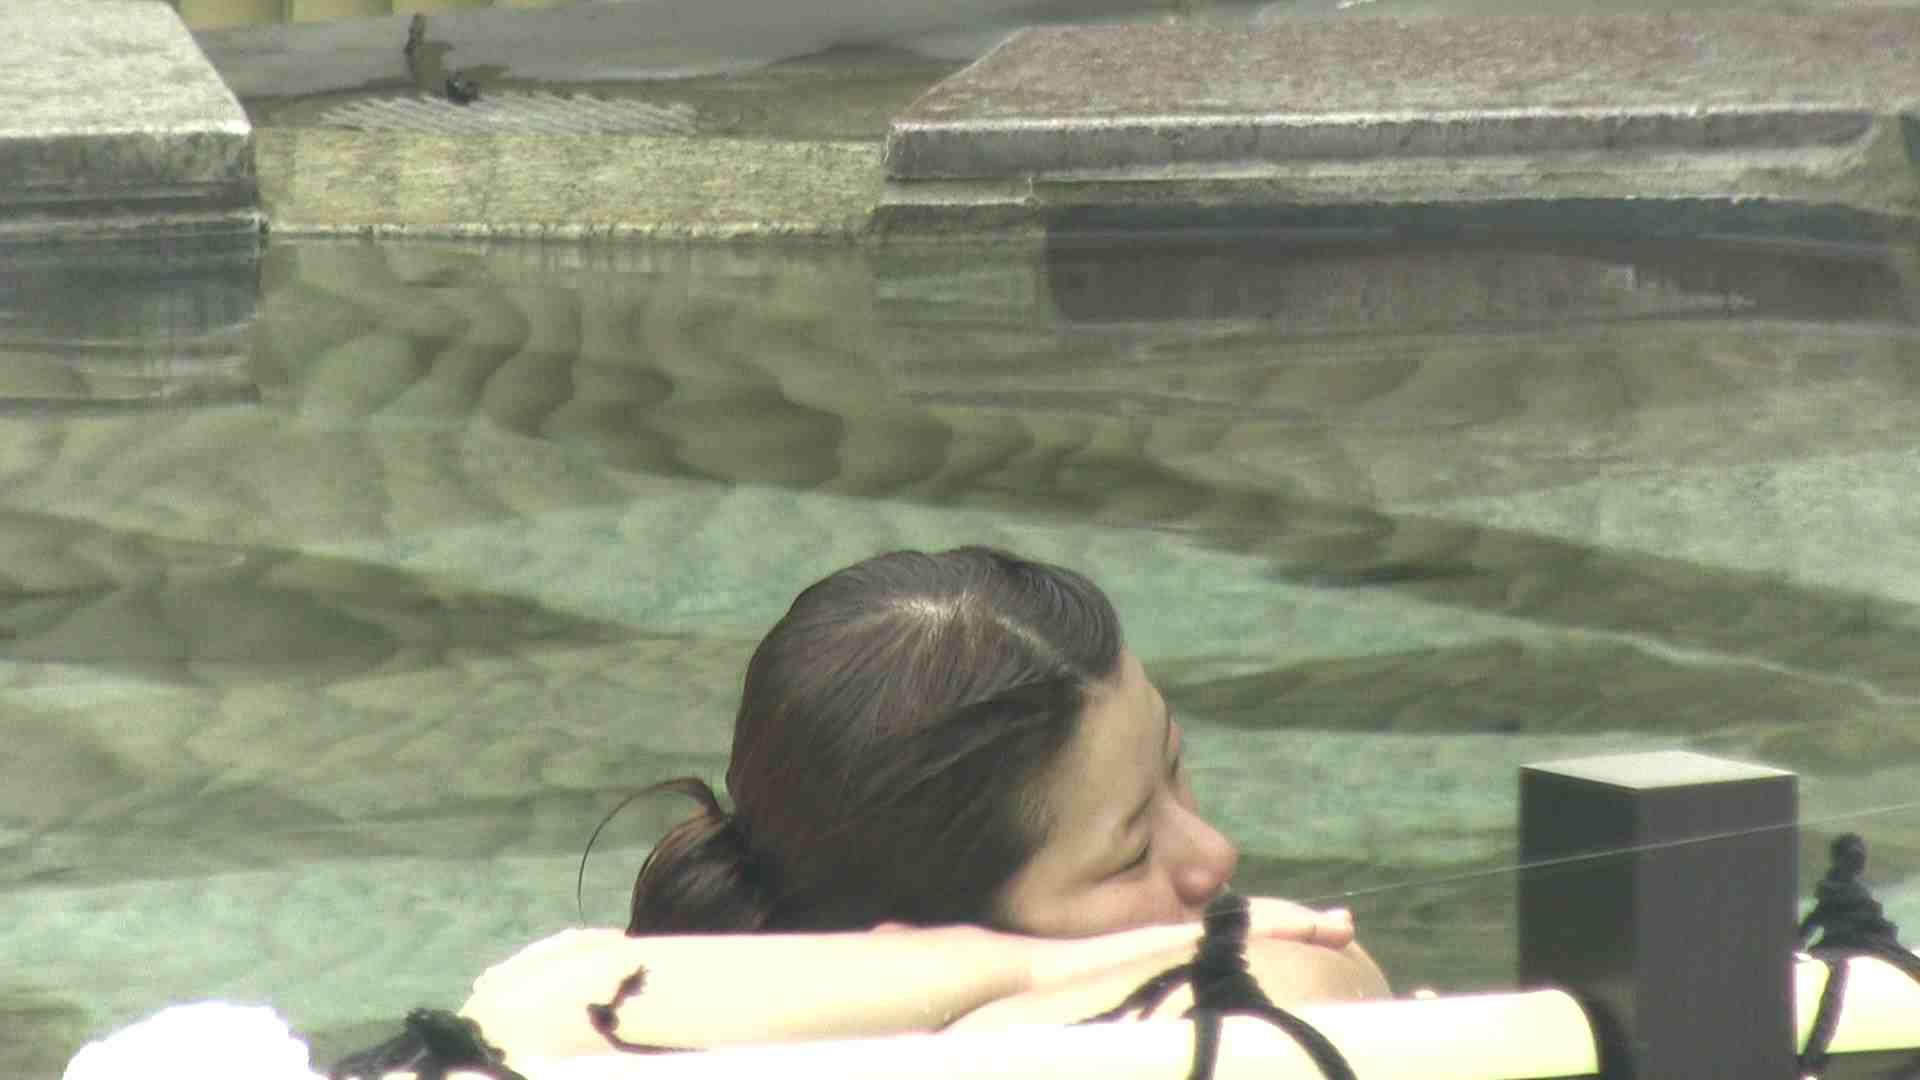 Aquaな露天風呂Vol.19【VIP】 盗撮 | HなOL  88pic 37